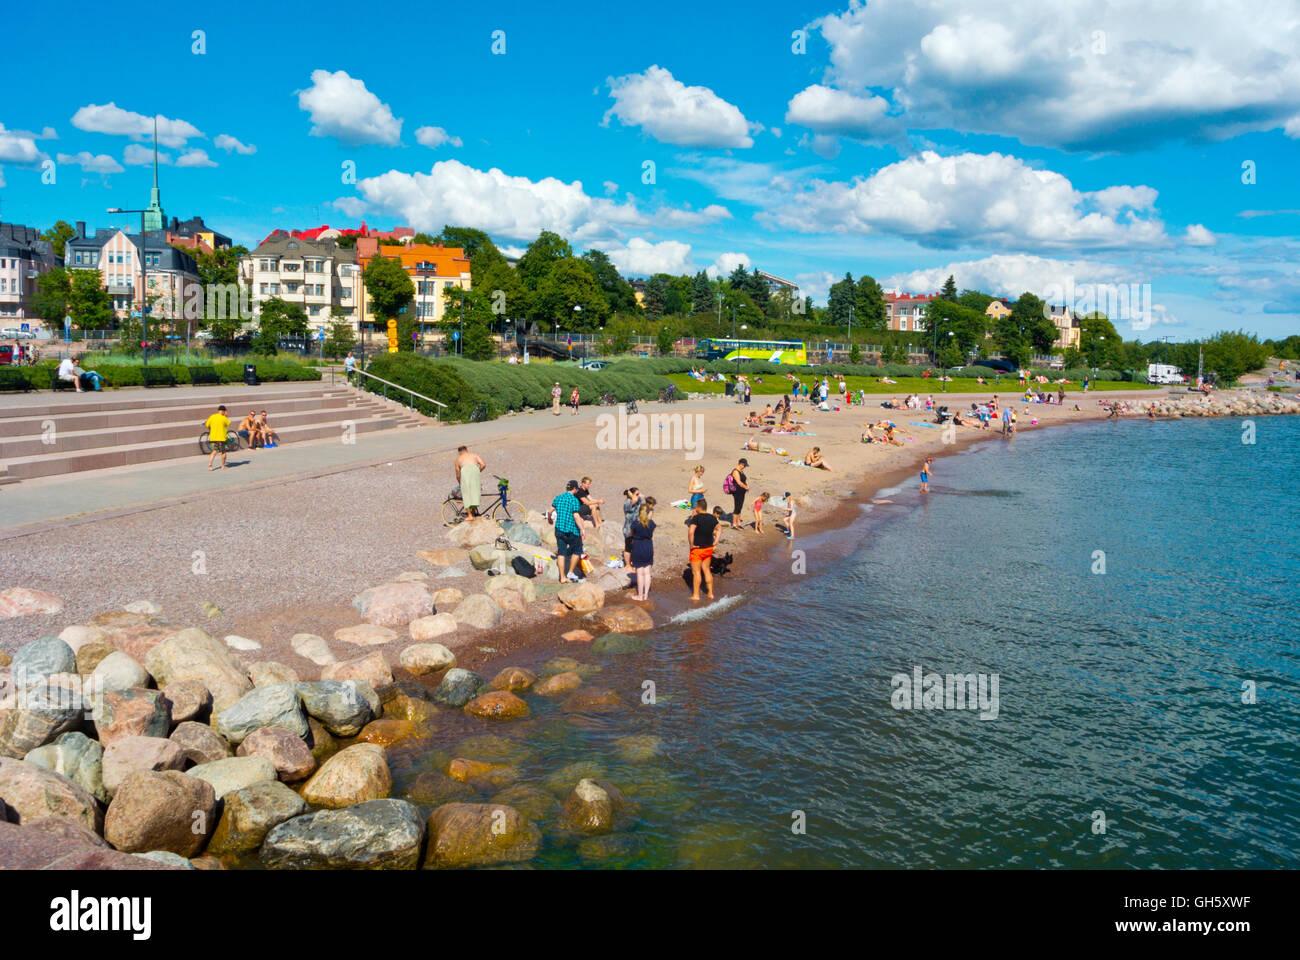 Eiranranta, new sand beach, Eira, Helsinki, Finland - Stock Image